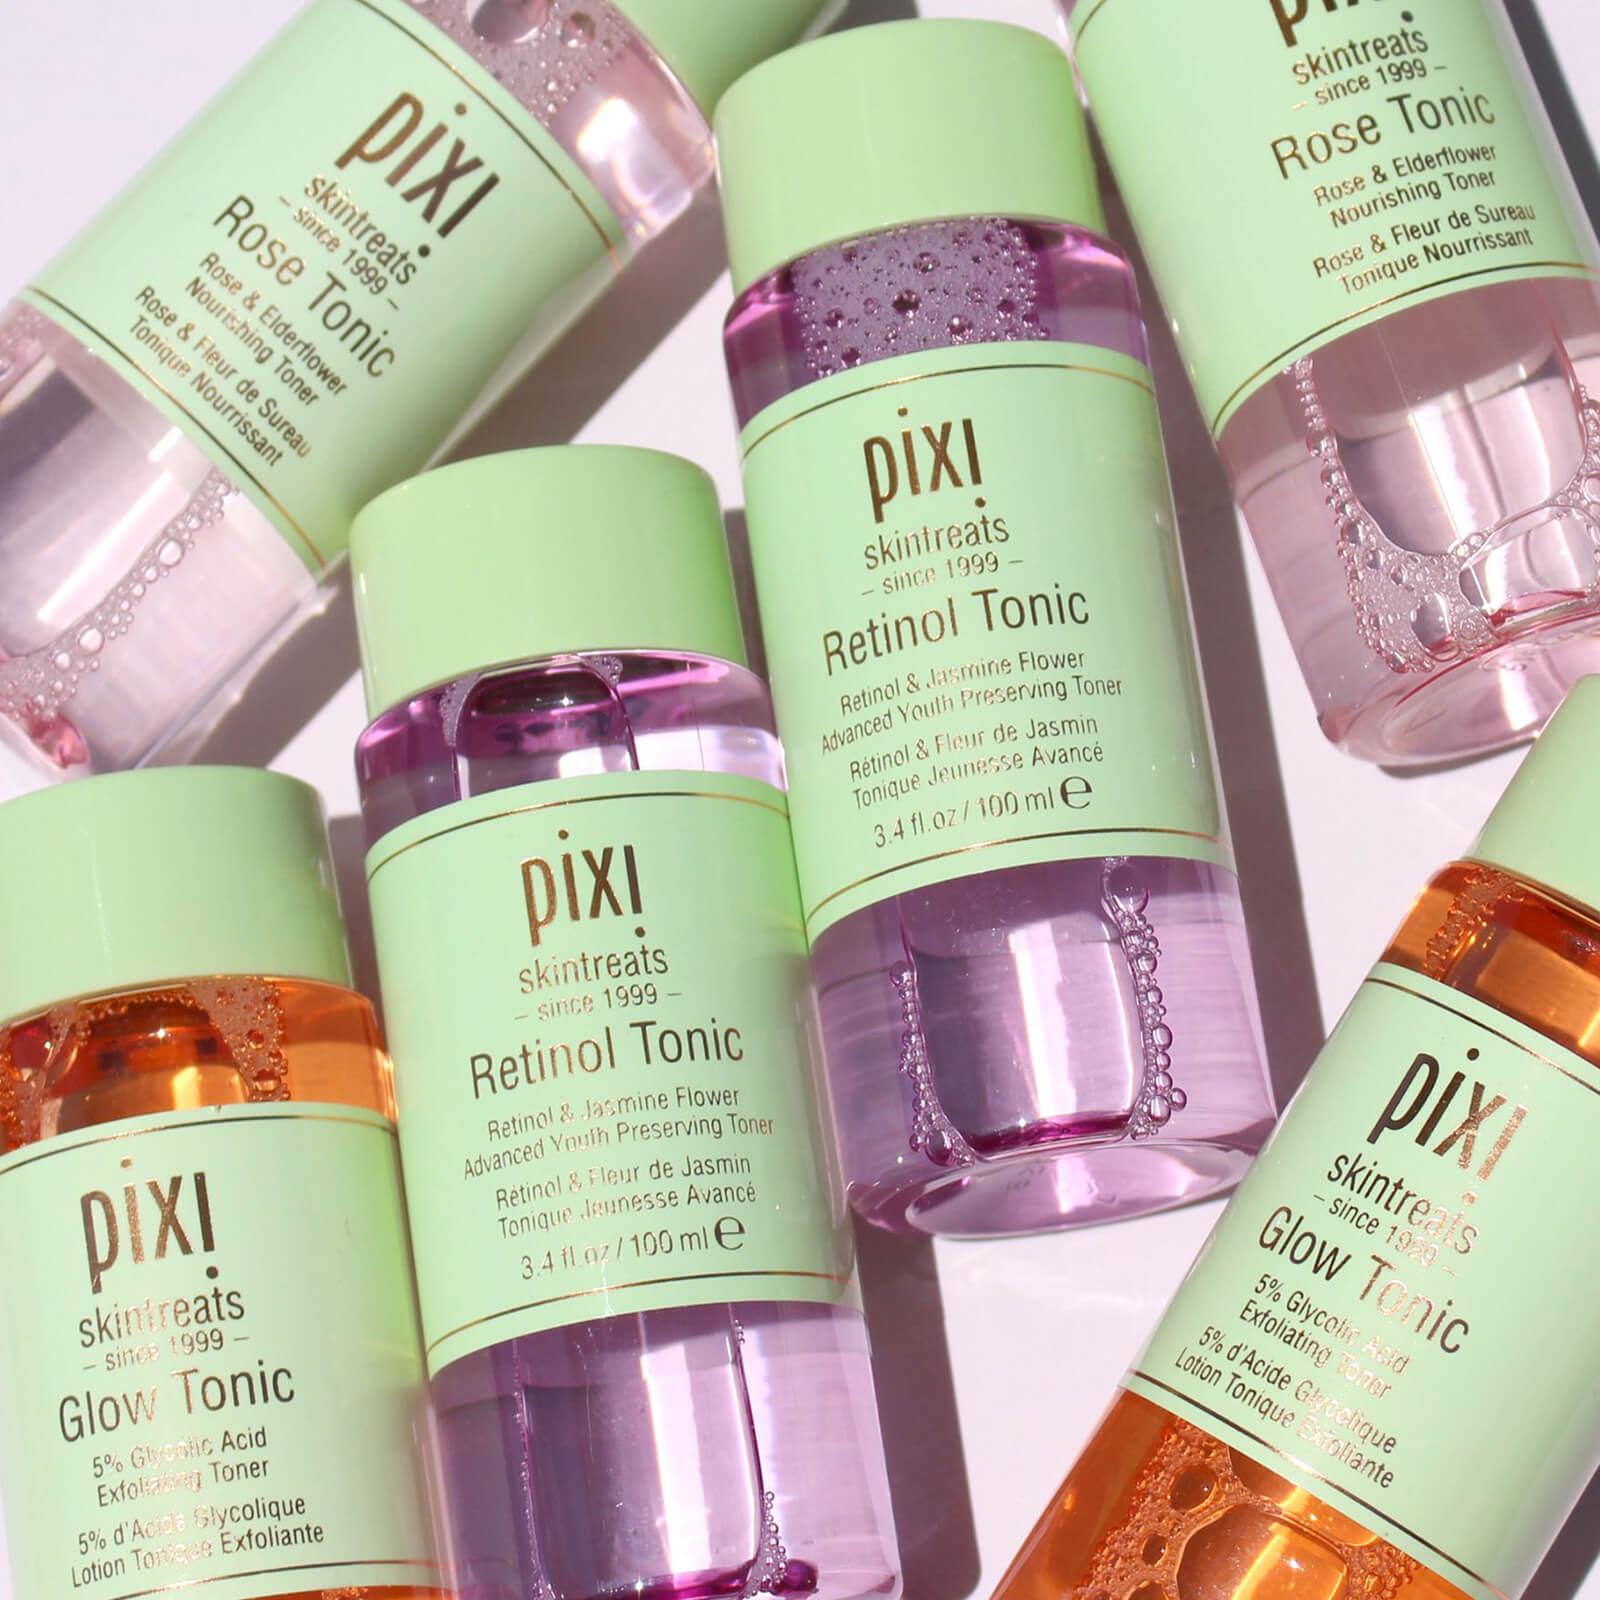 Pixi 5% Glycolic Acid Glow Tonic Moisturizing Oil-controlling Essence Toners Astringent for Female Makeup Cosmetics For Face glycolic acid 10